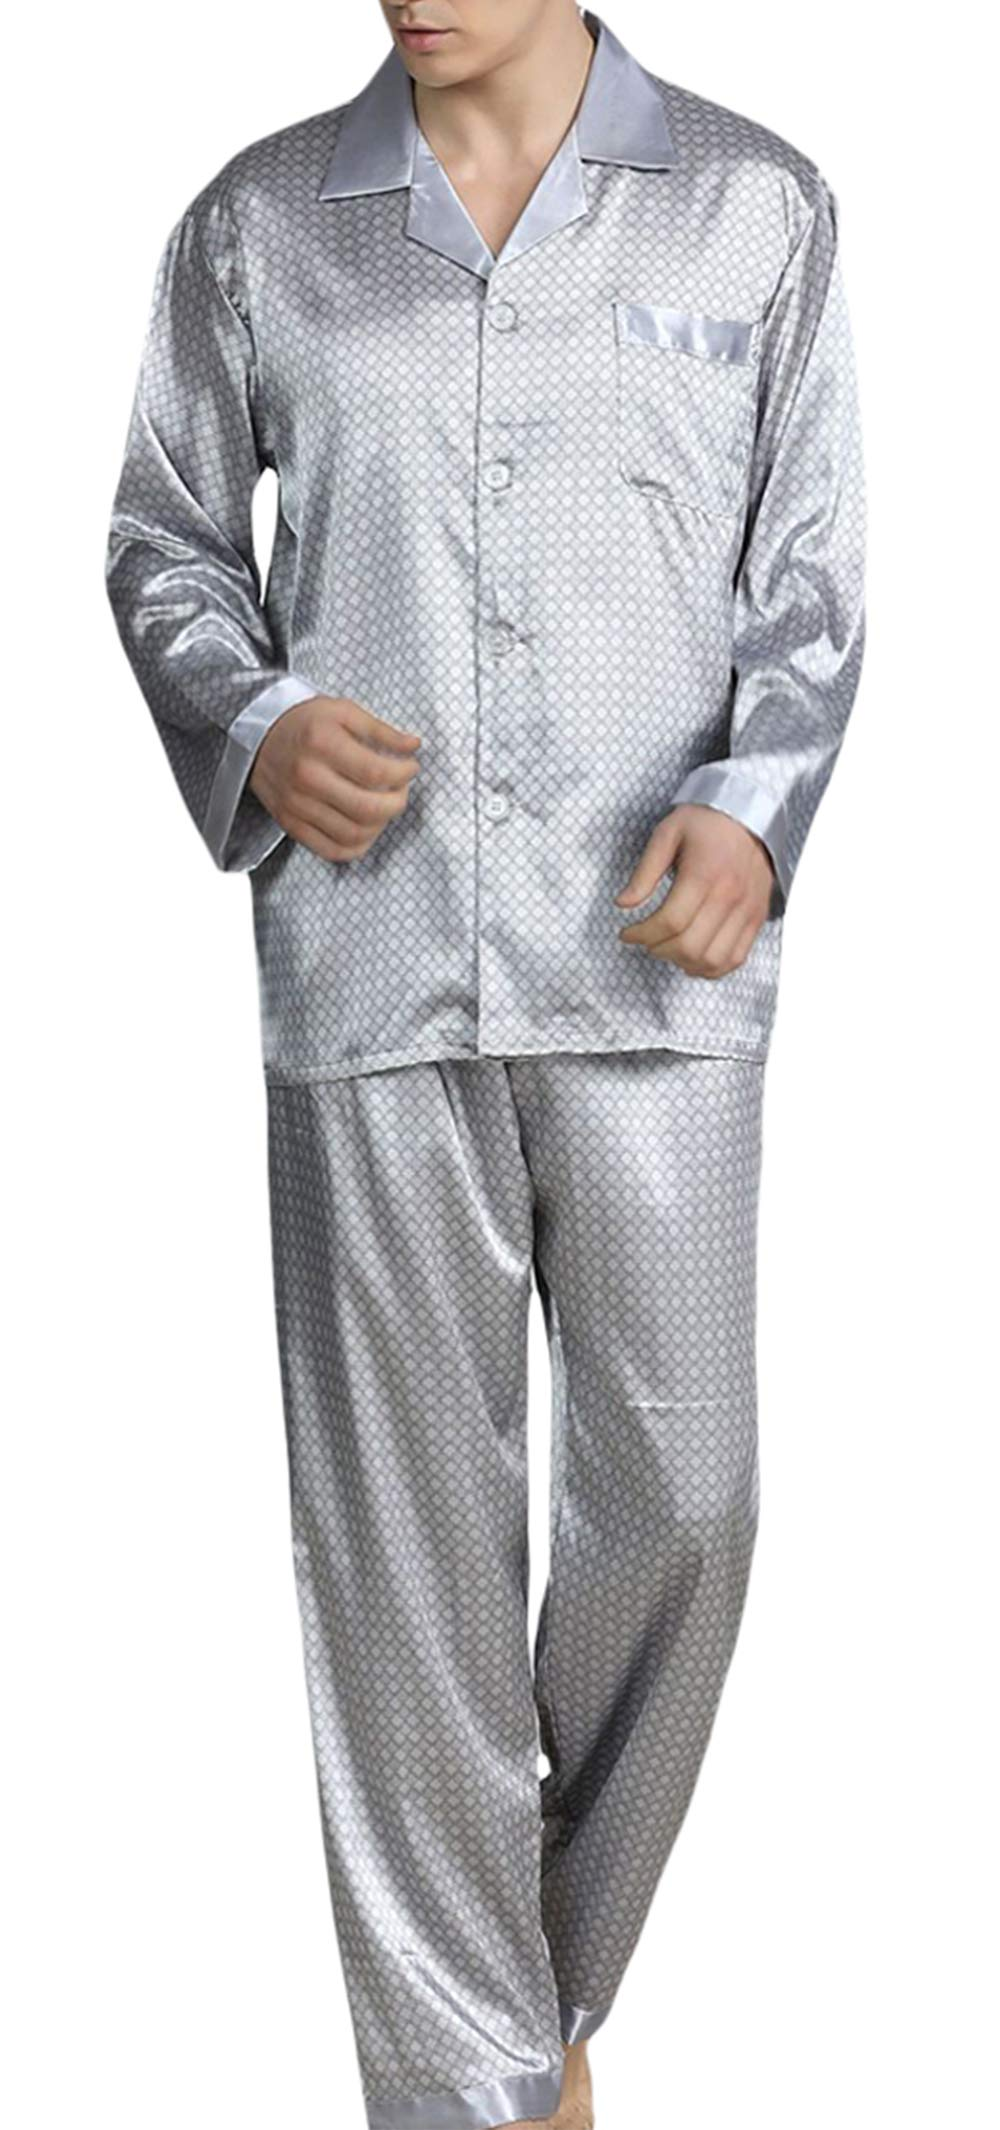 YIMANIE Mens Silk Satin Pattern Pajamas Set Classic Sleepwear Loungewear Long Sleeve Nightwear Set Sleep Shirt & Sleep Pant Silver Grey